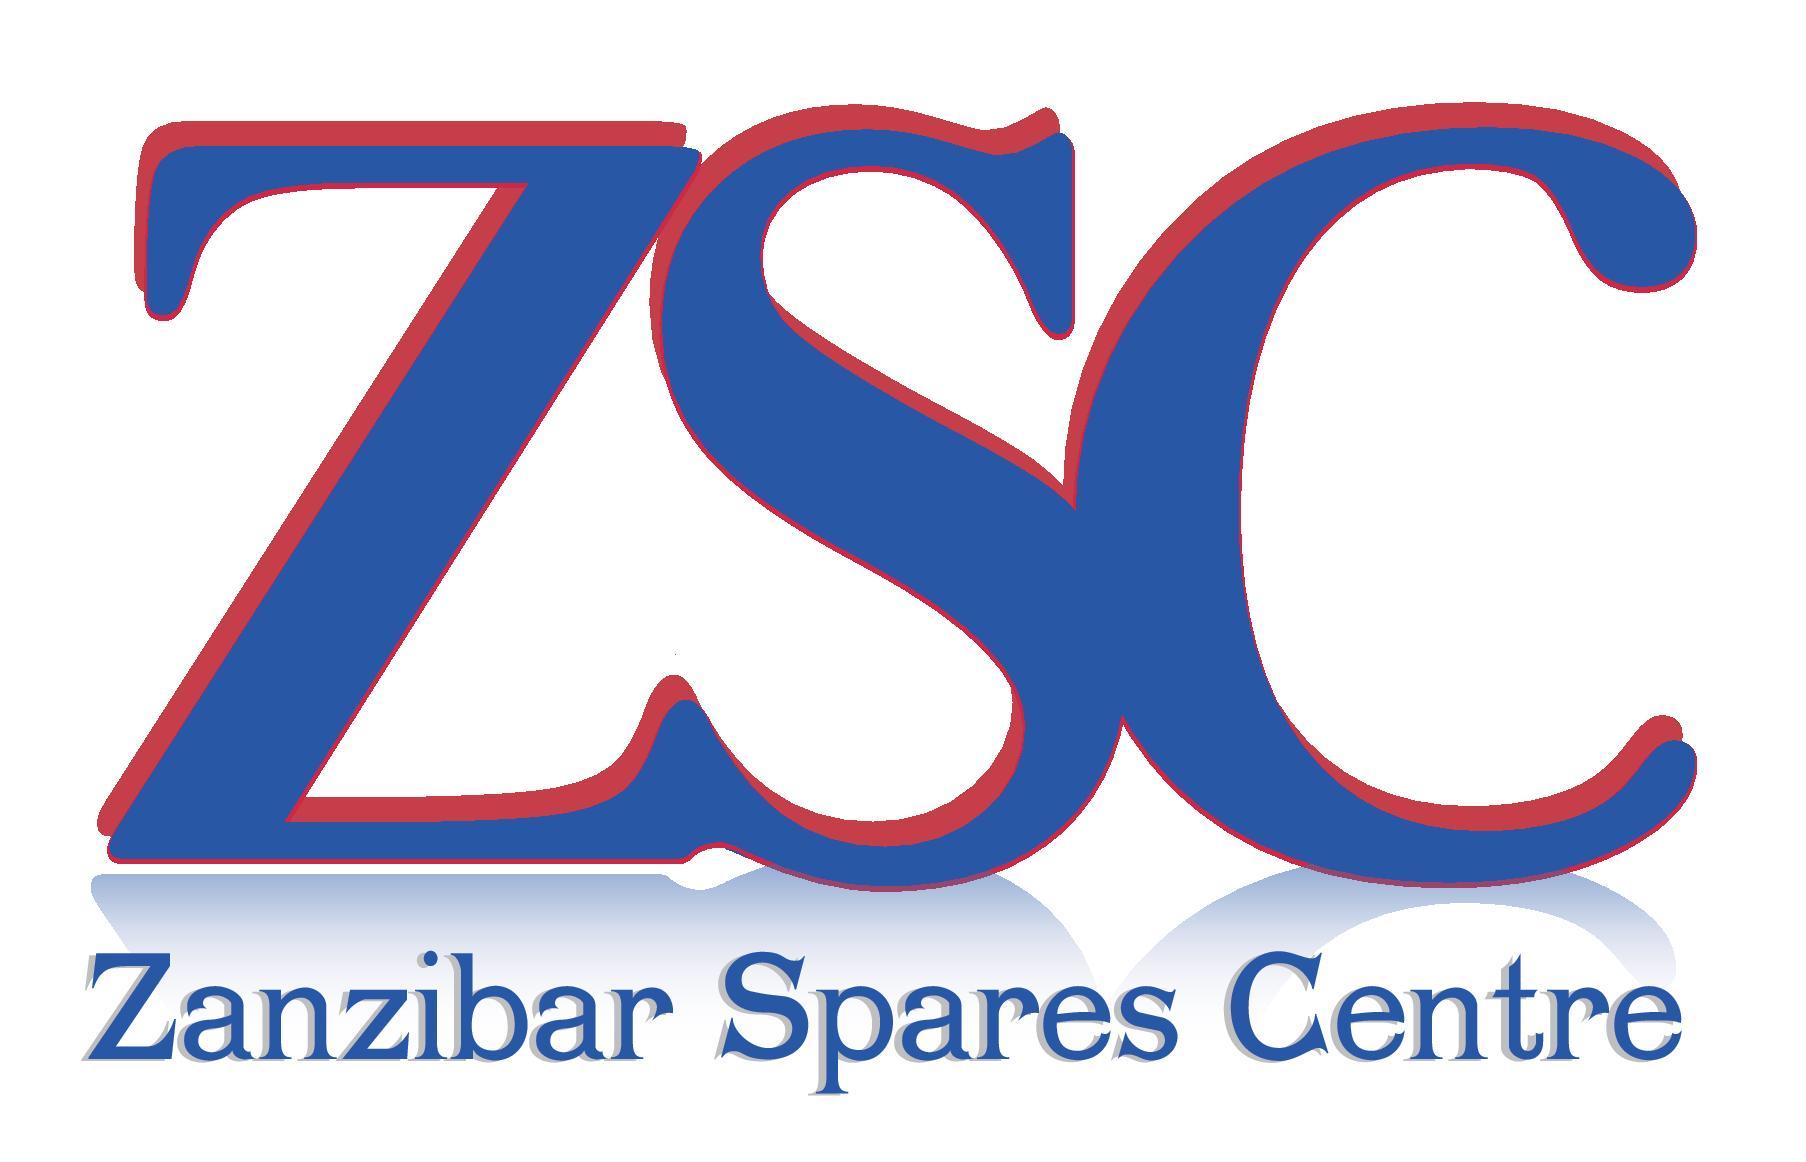 Zanzibar Spares